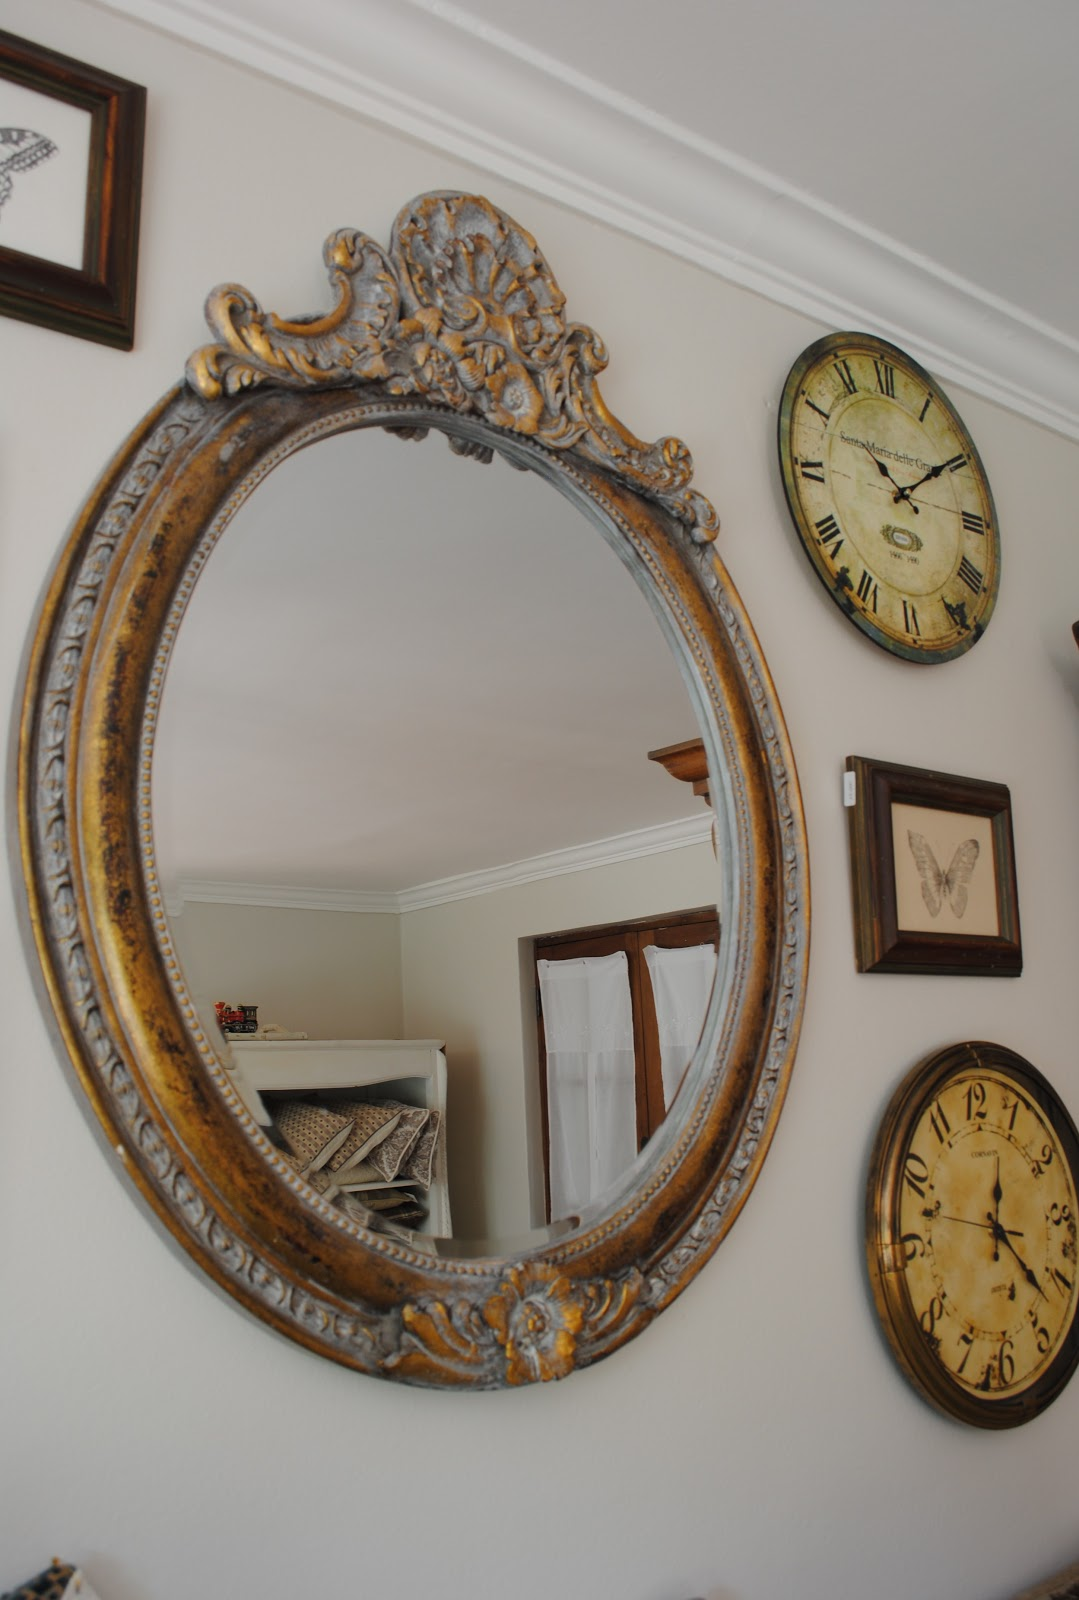 Paz montealegre decoraci n espejos provenzal espejos for Decoracion con espejos antiguos